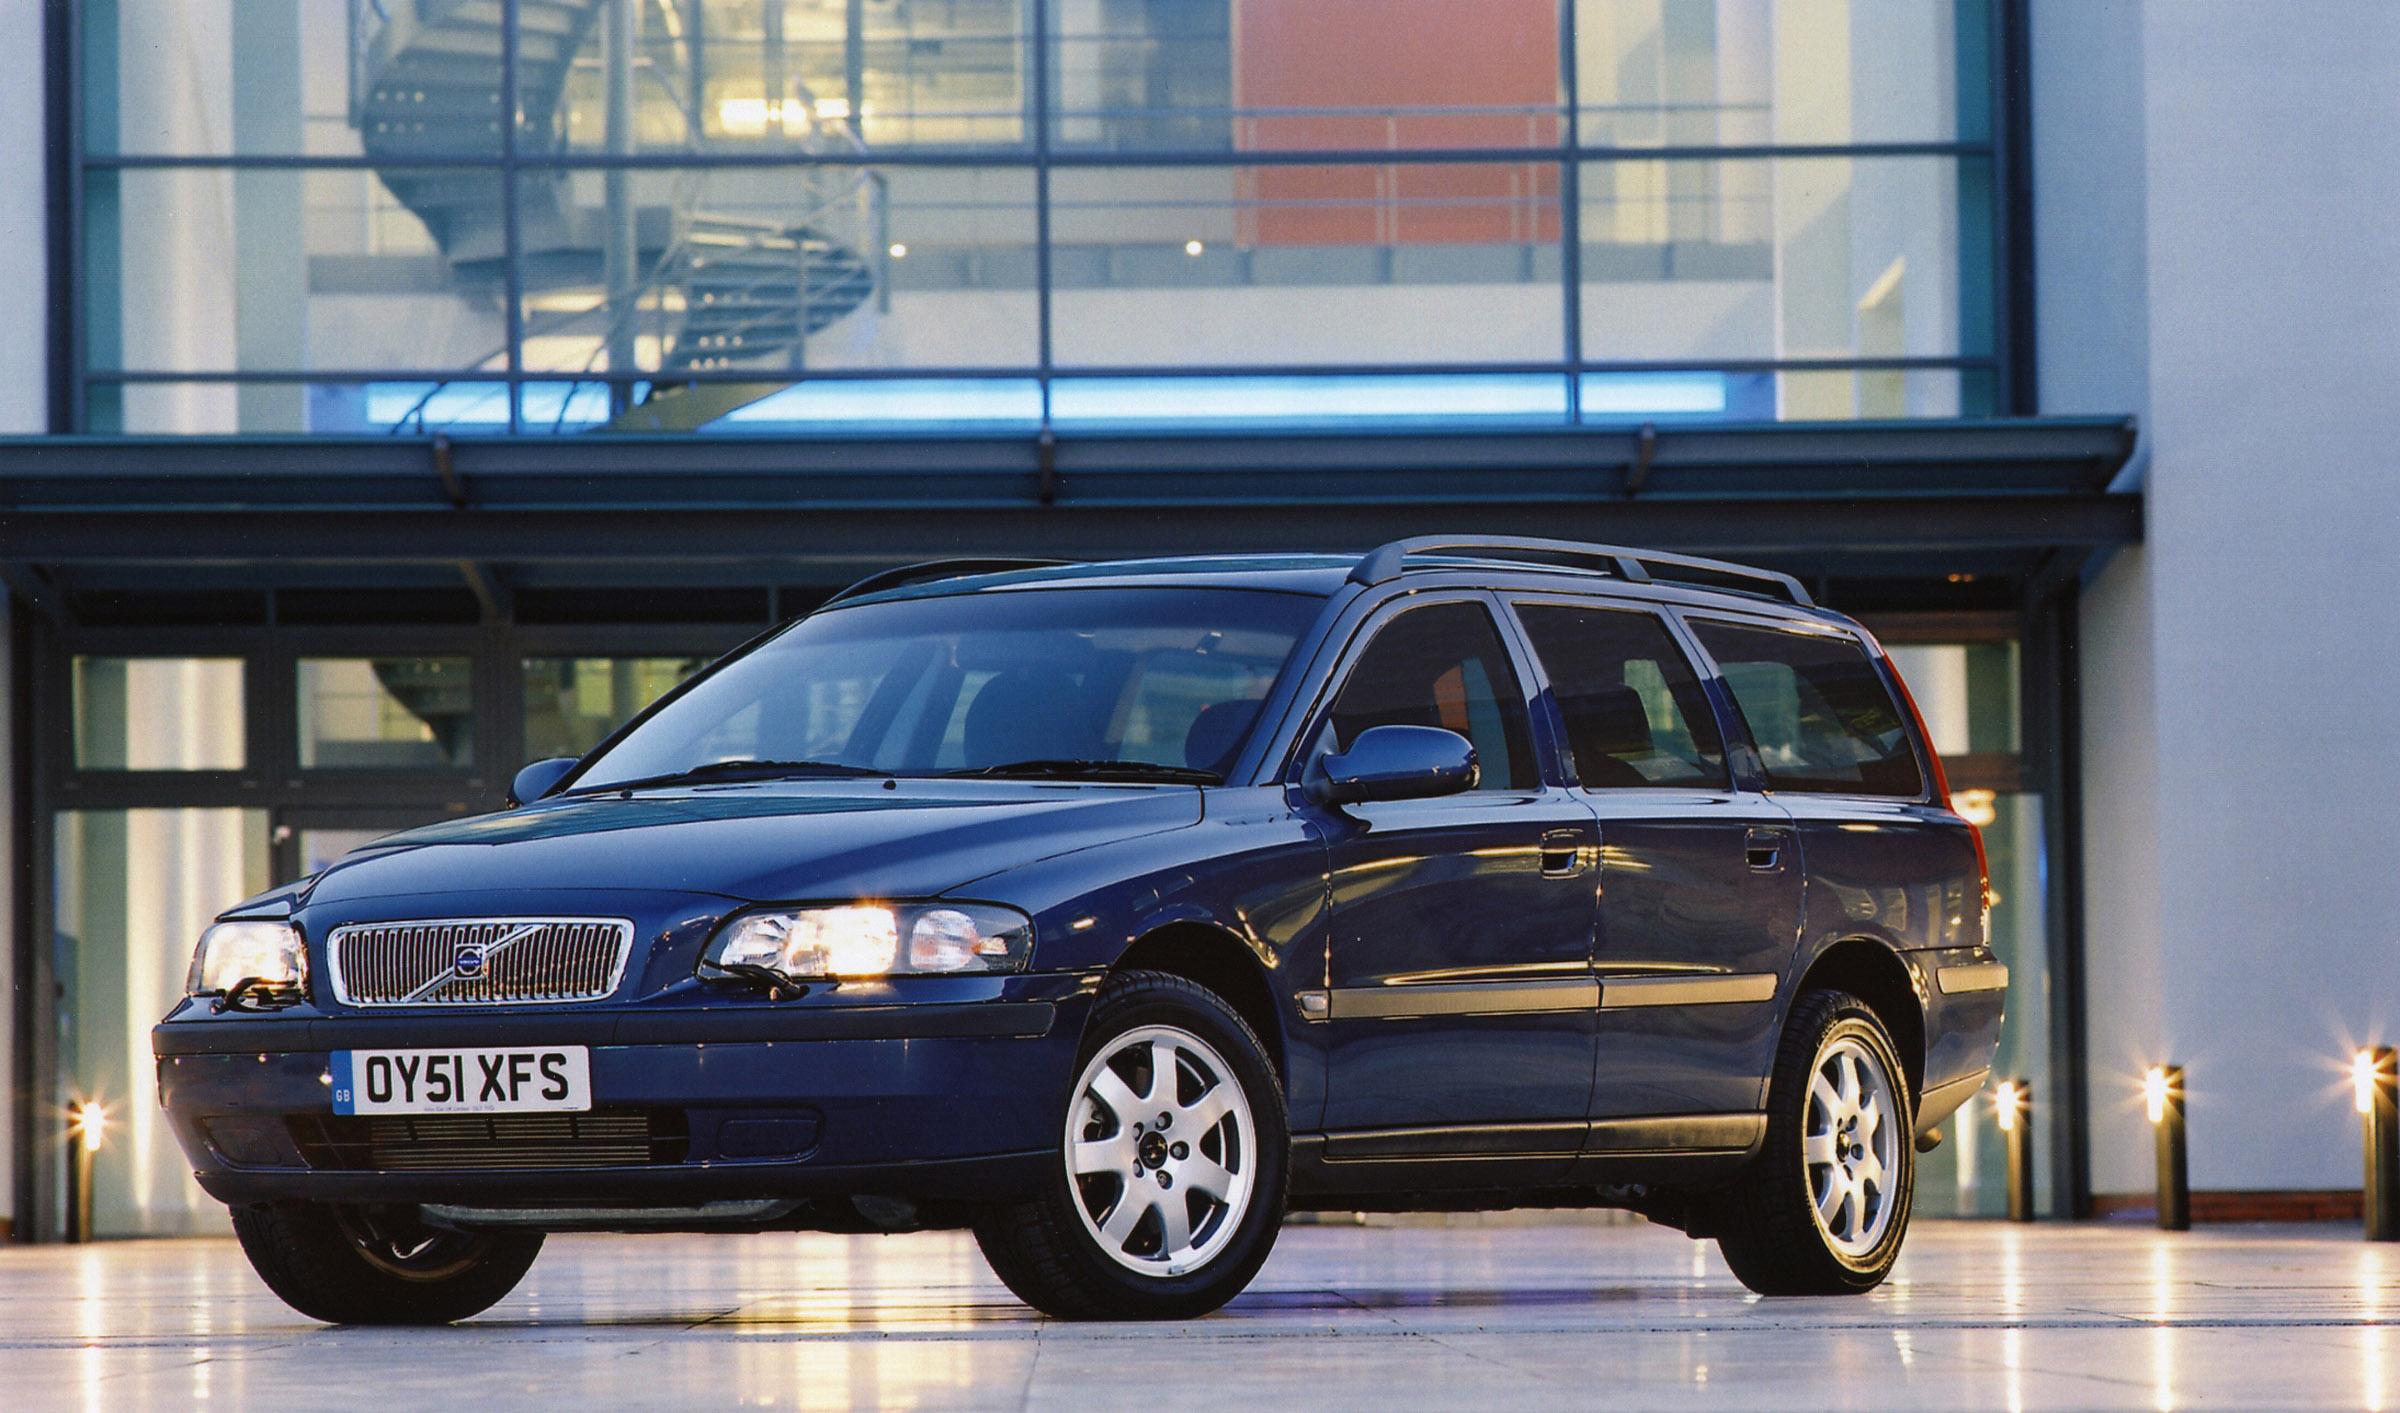 Mercedes Benz Amg >> Volvo V70 2001 - Picture 14179